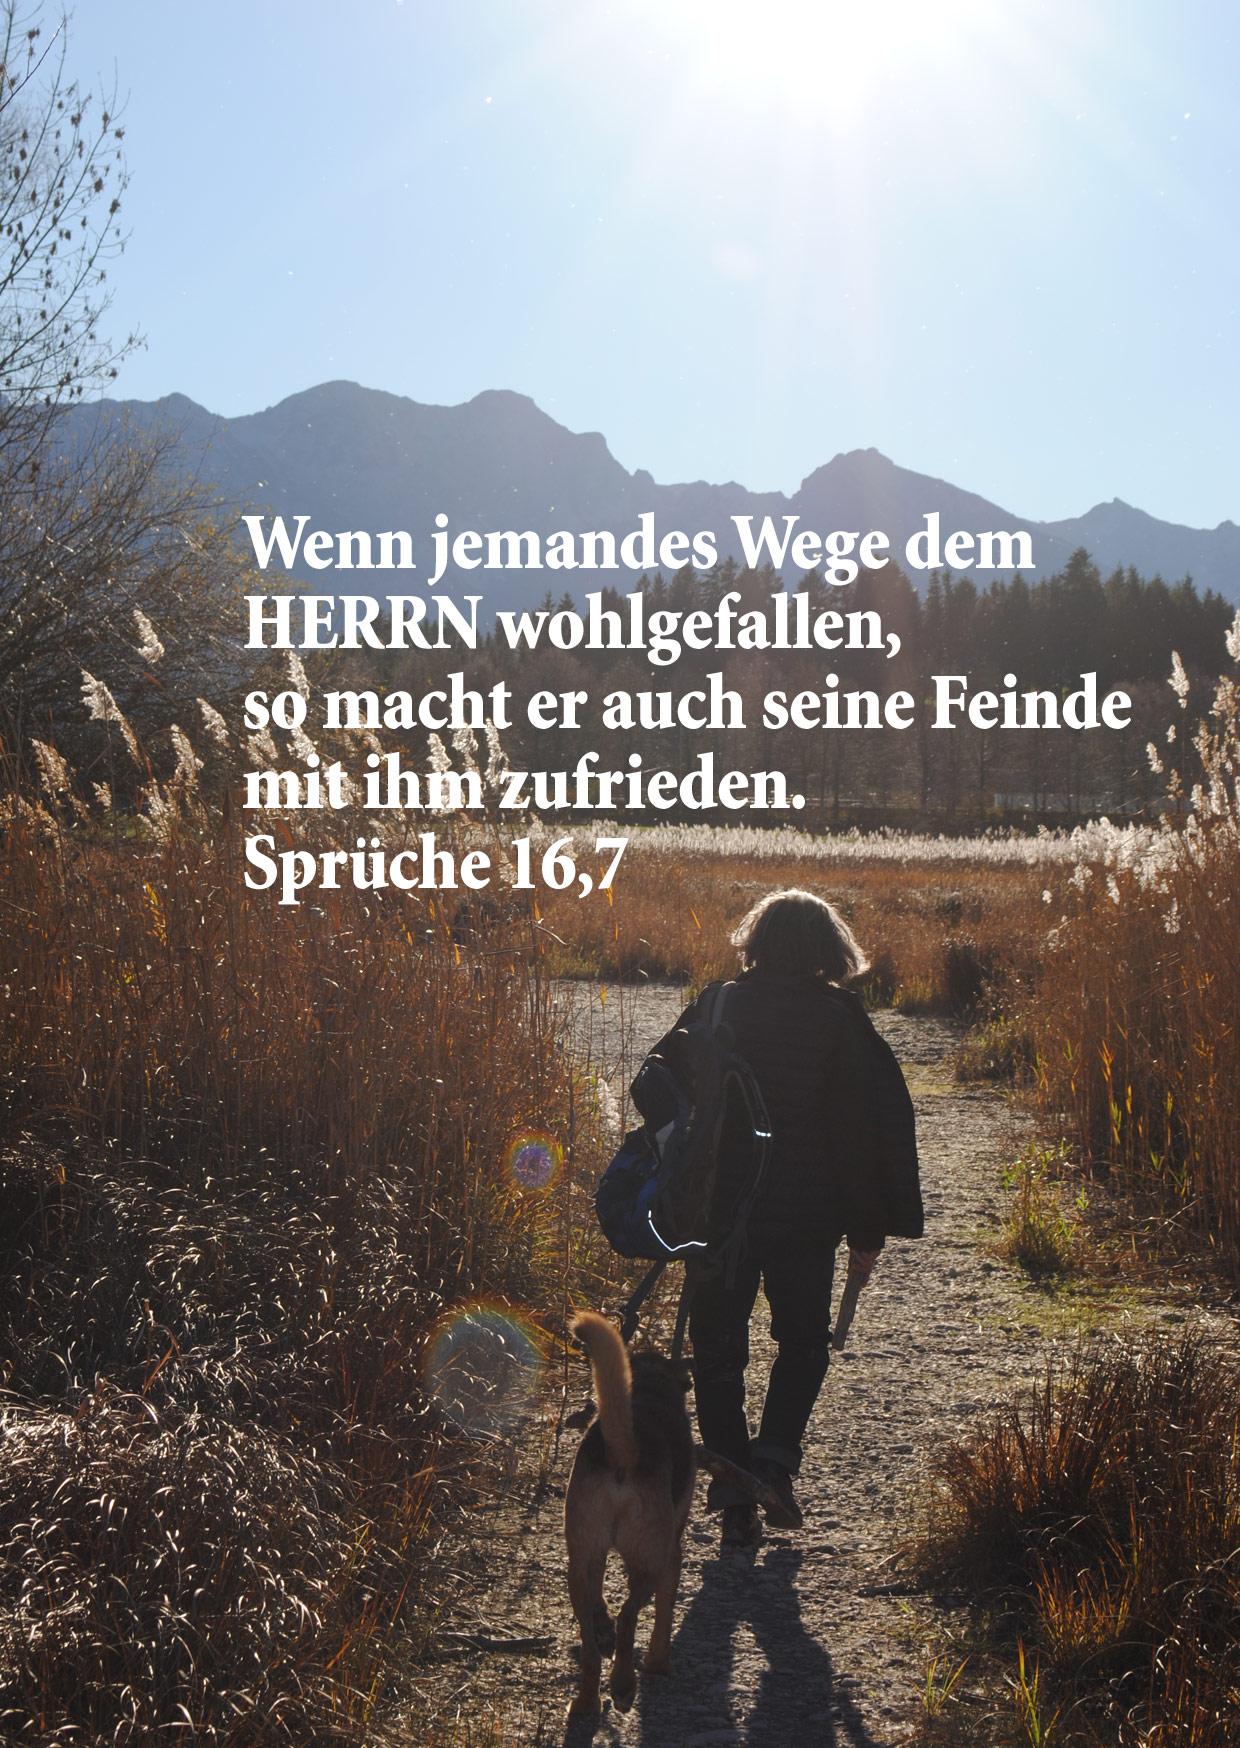 Bild mit Bibelzitat, Sprüche 14,7 Foto: Christine Danzer go 4 Jesus